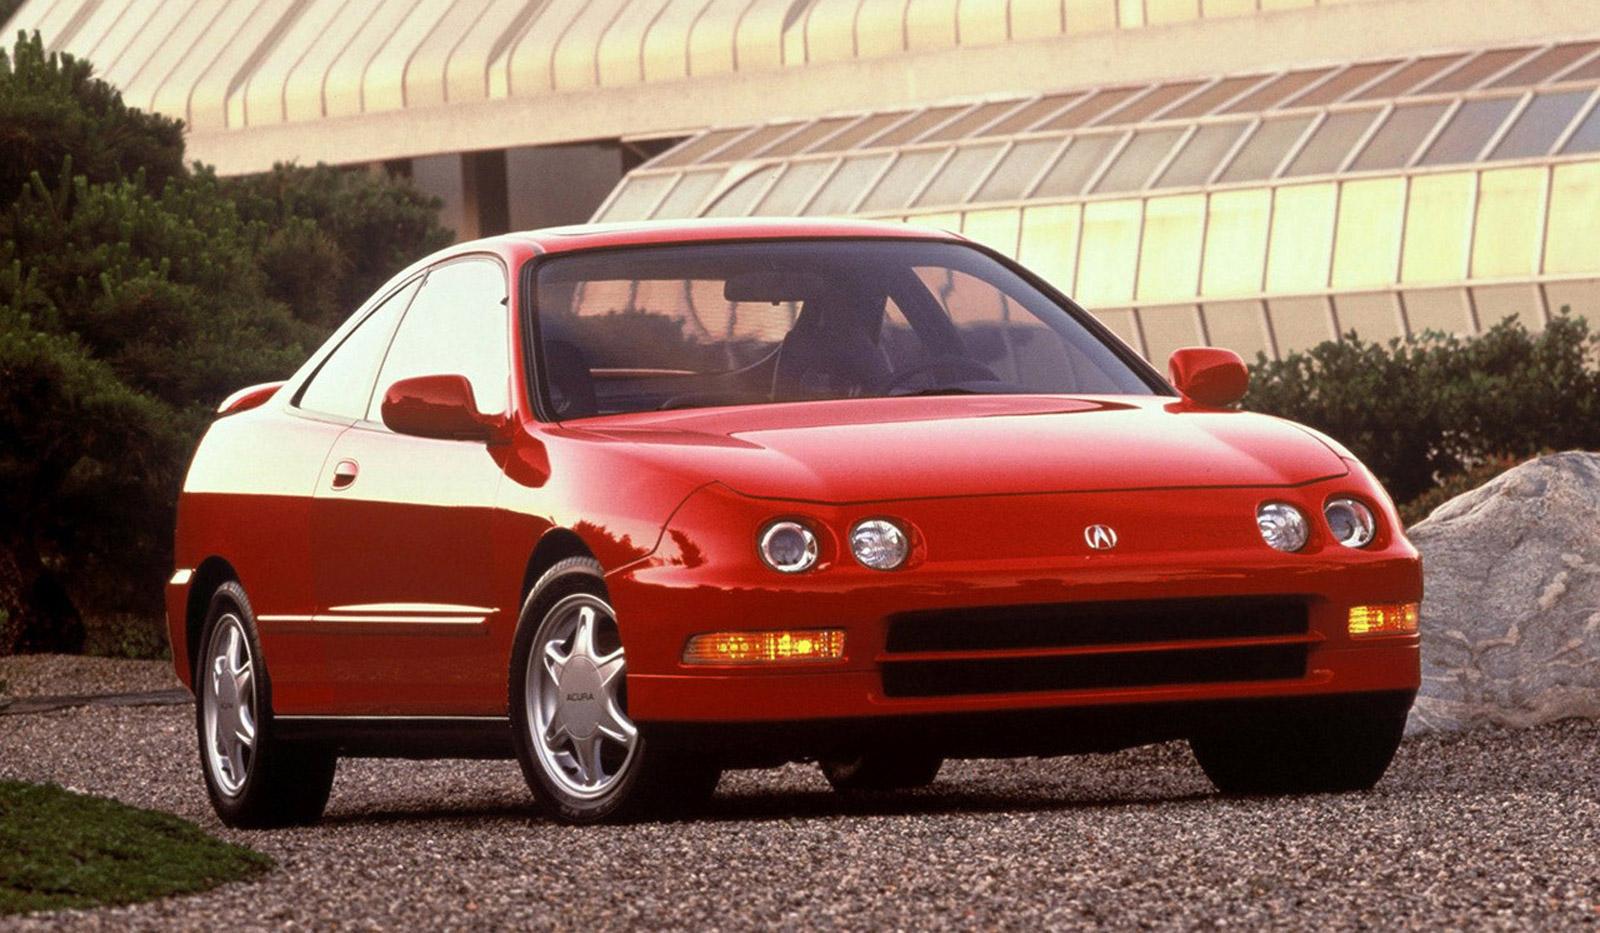 Acura Integra Only Luxury Model To Make Top Ten Most Stolen List